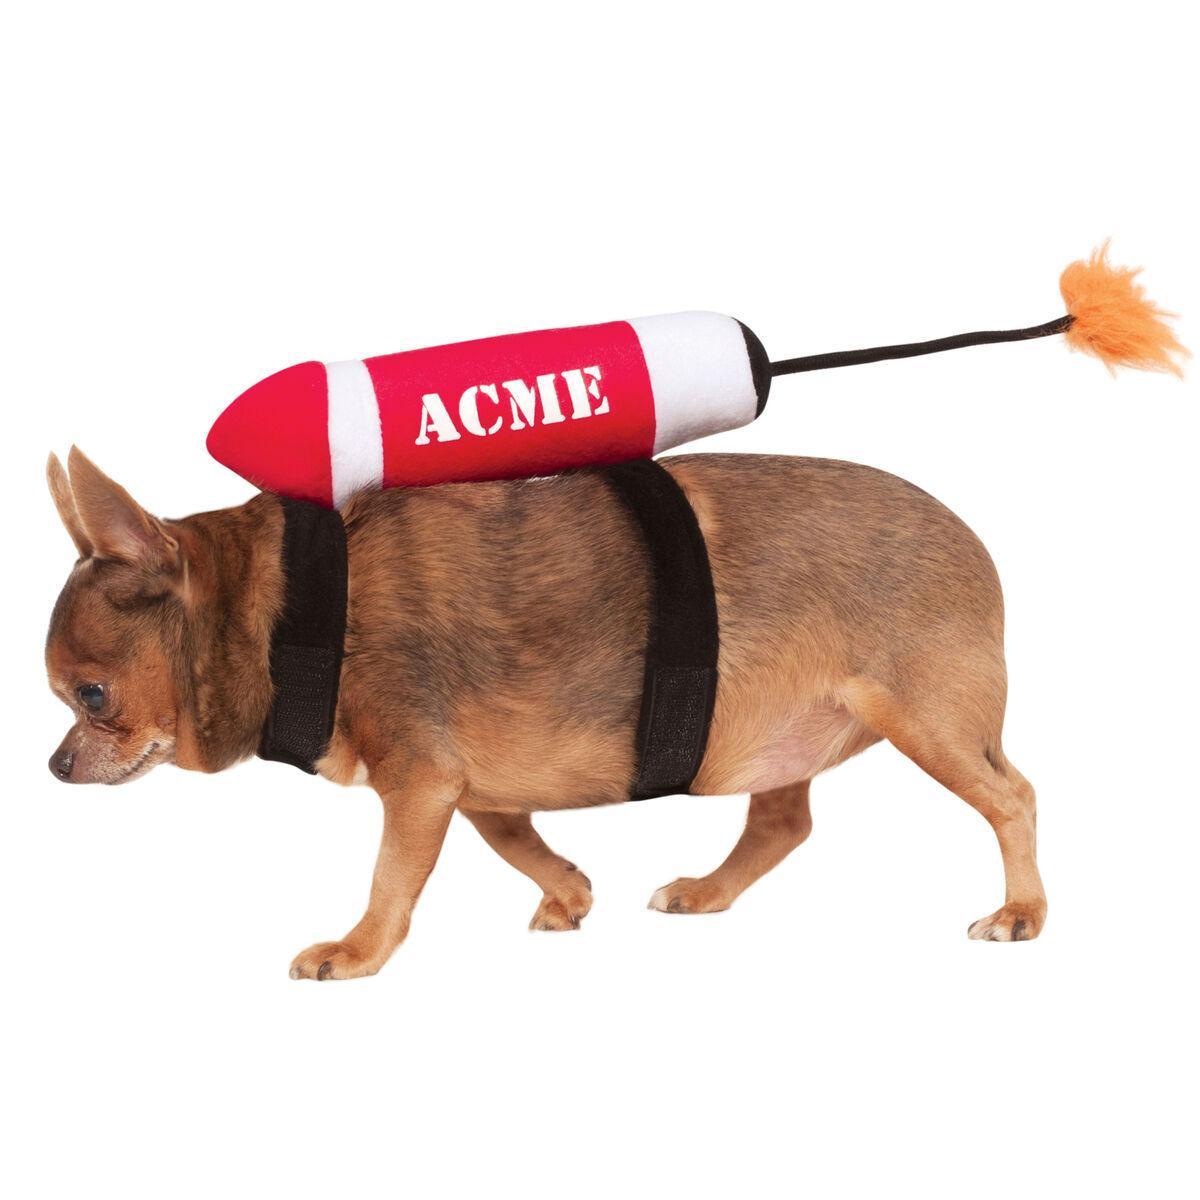 Acme Dynamite Dog Costume by Rubies